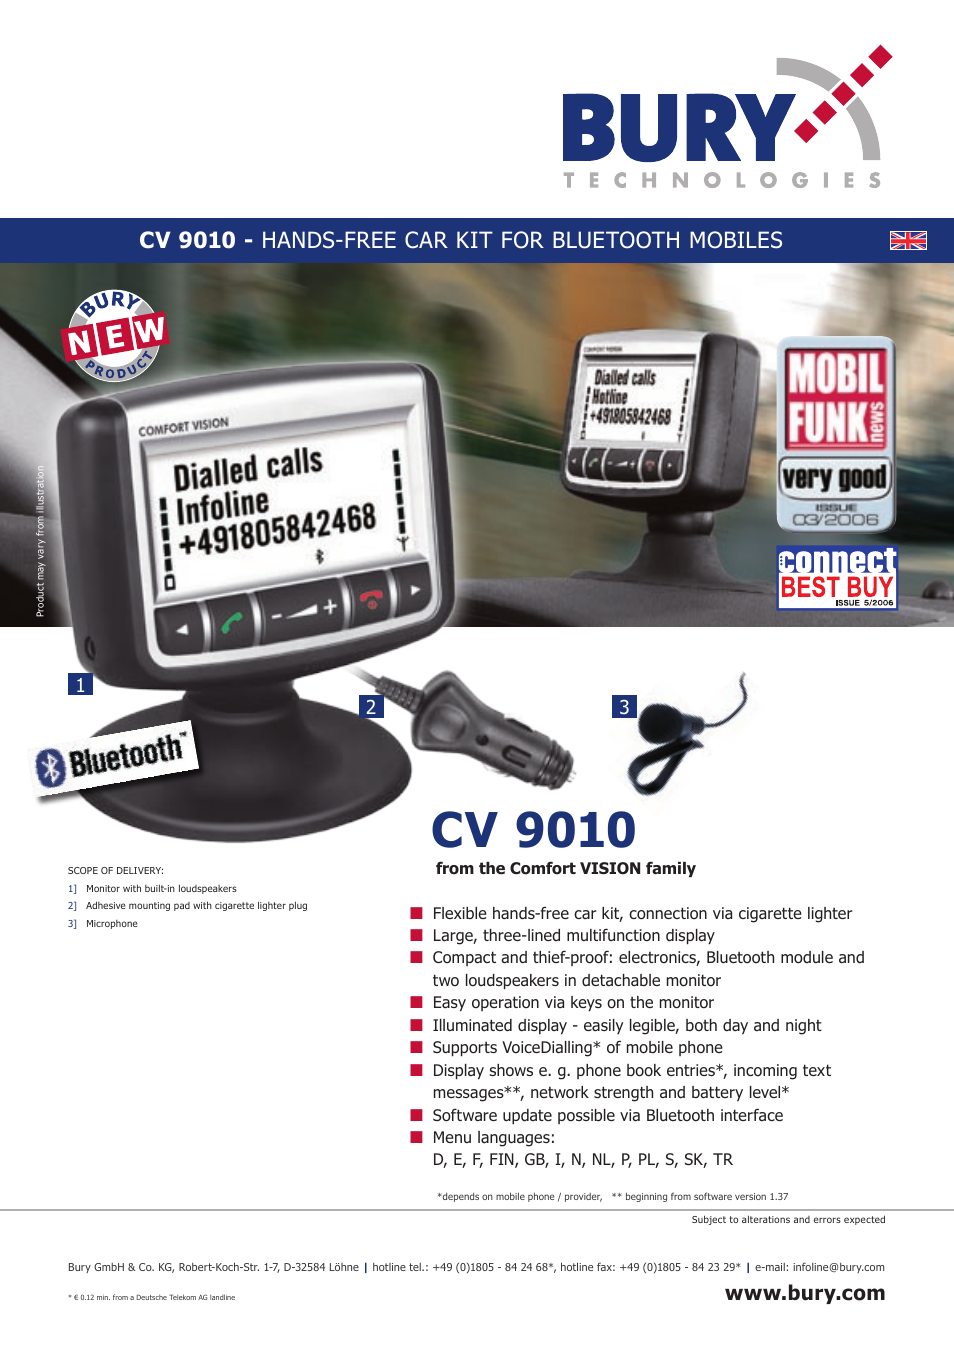 THB Bury CV 9010 User Manual